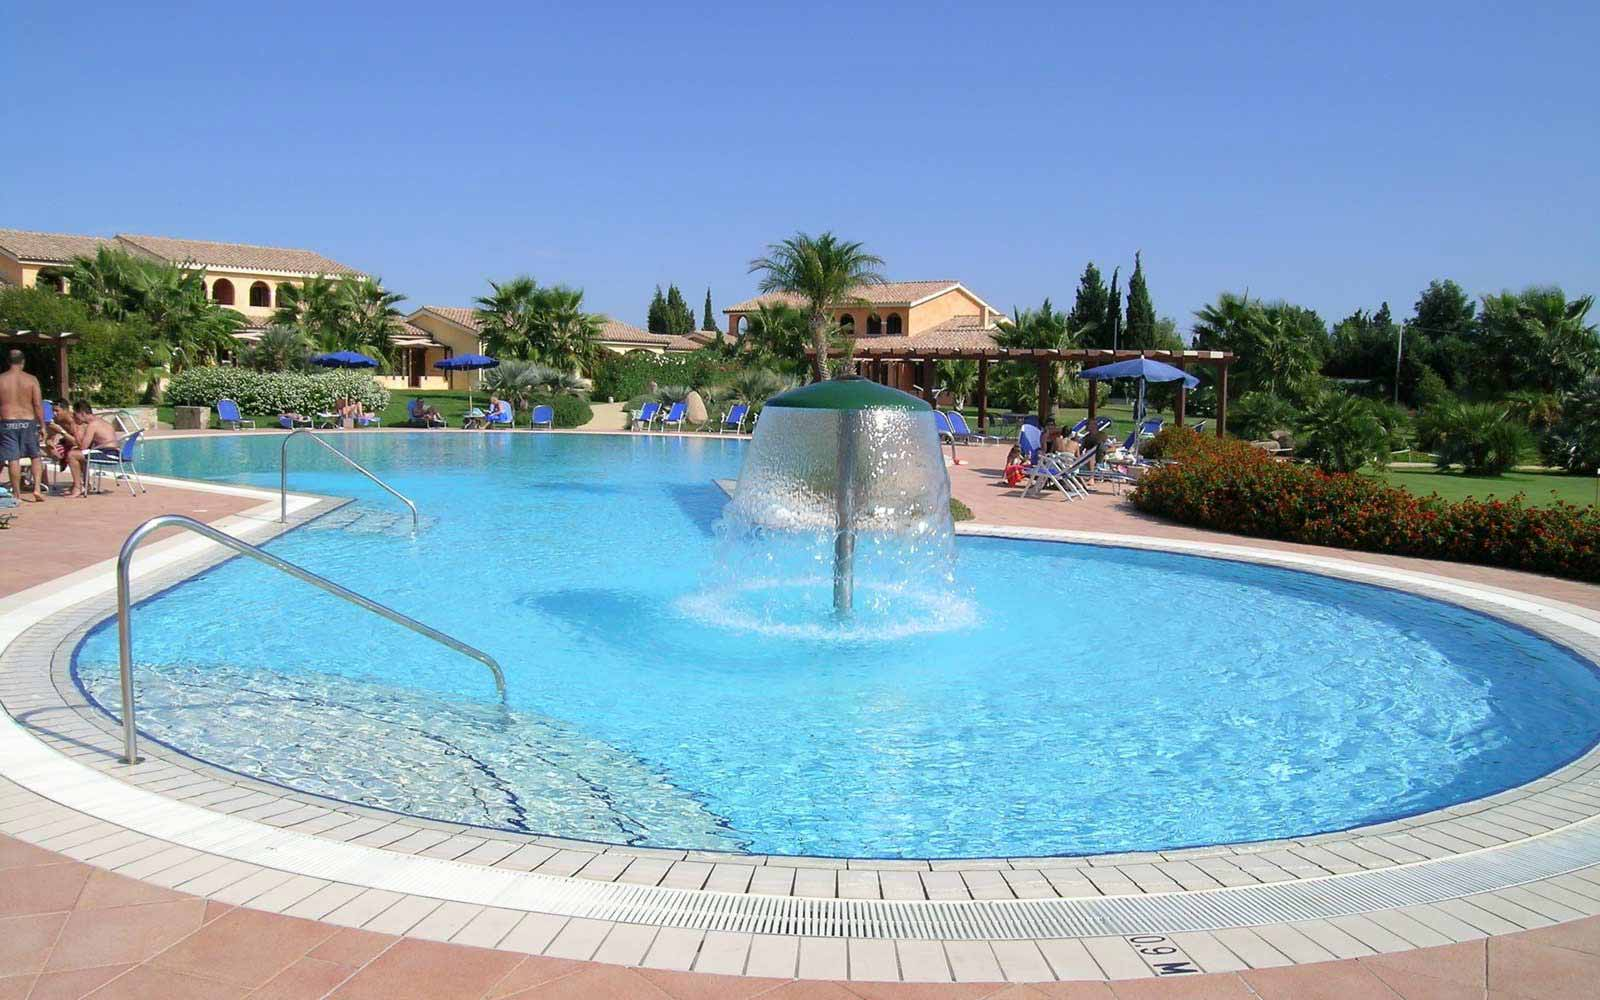 Swimming pool at Lantana Resort